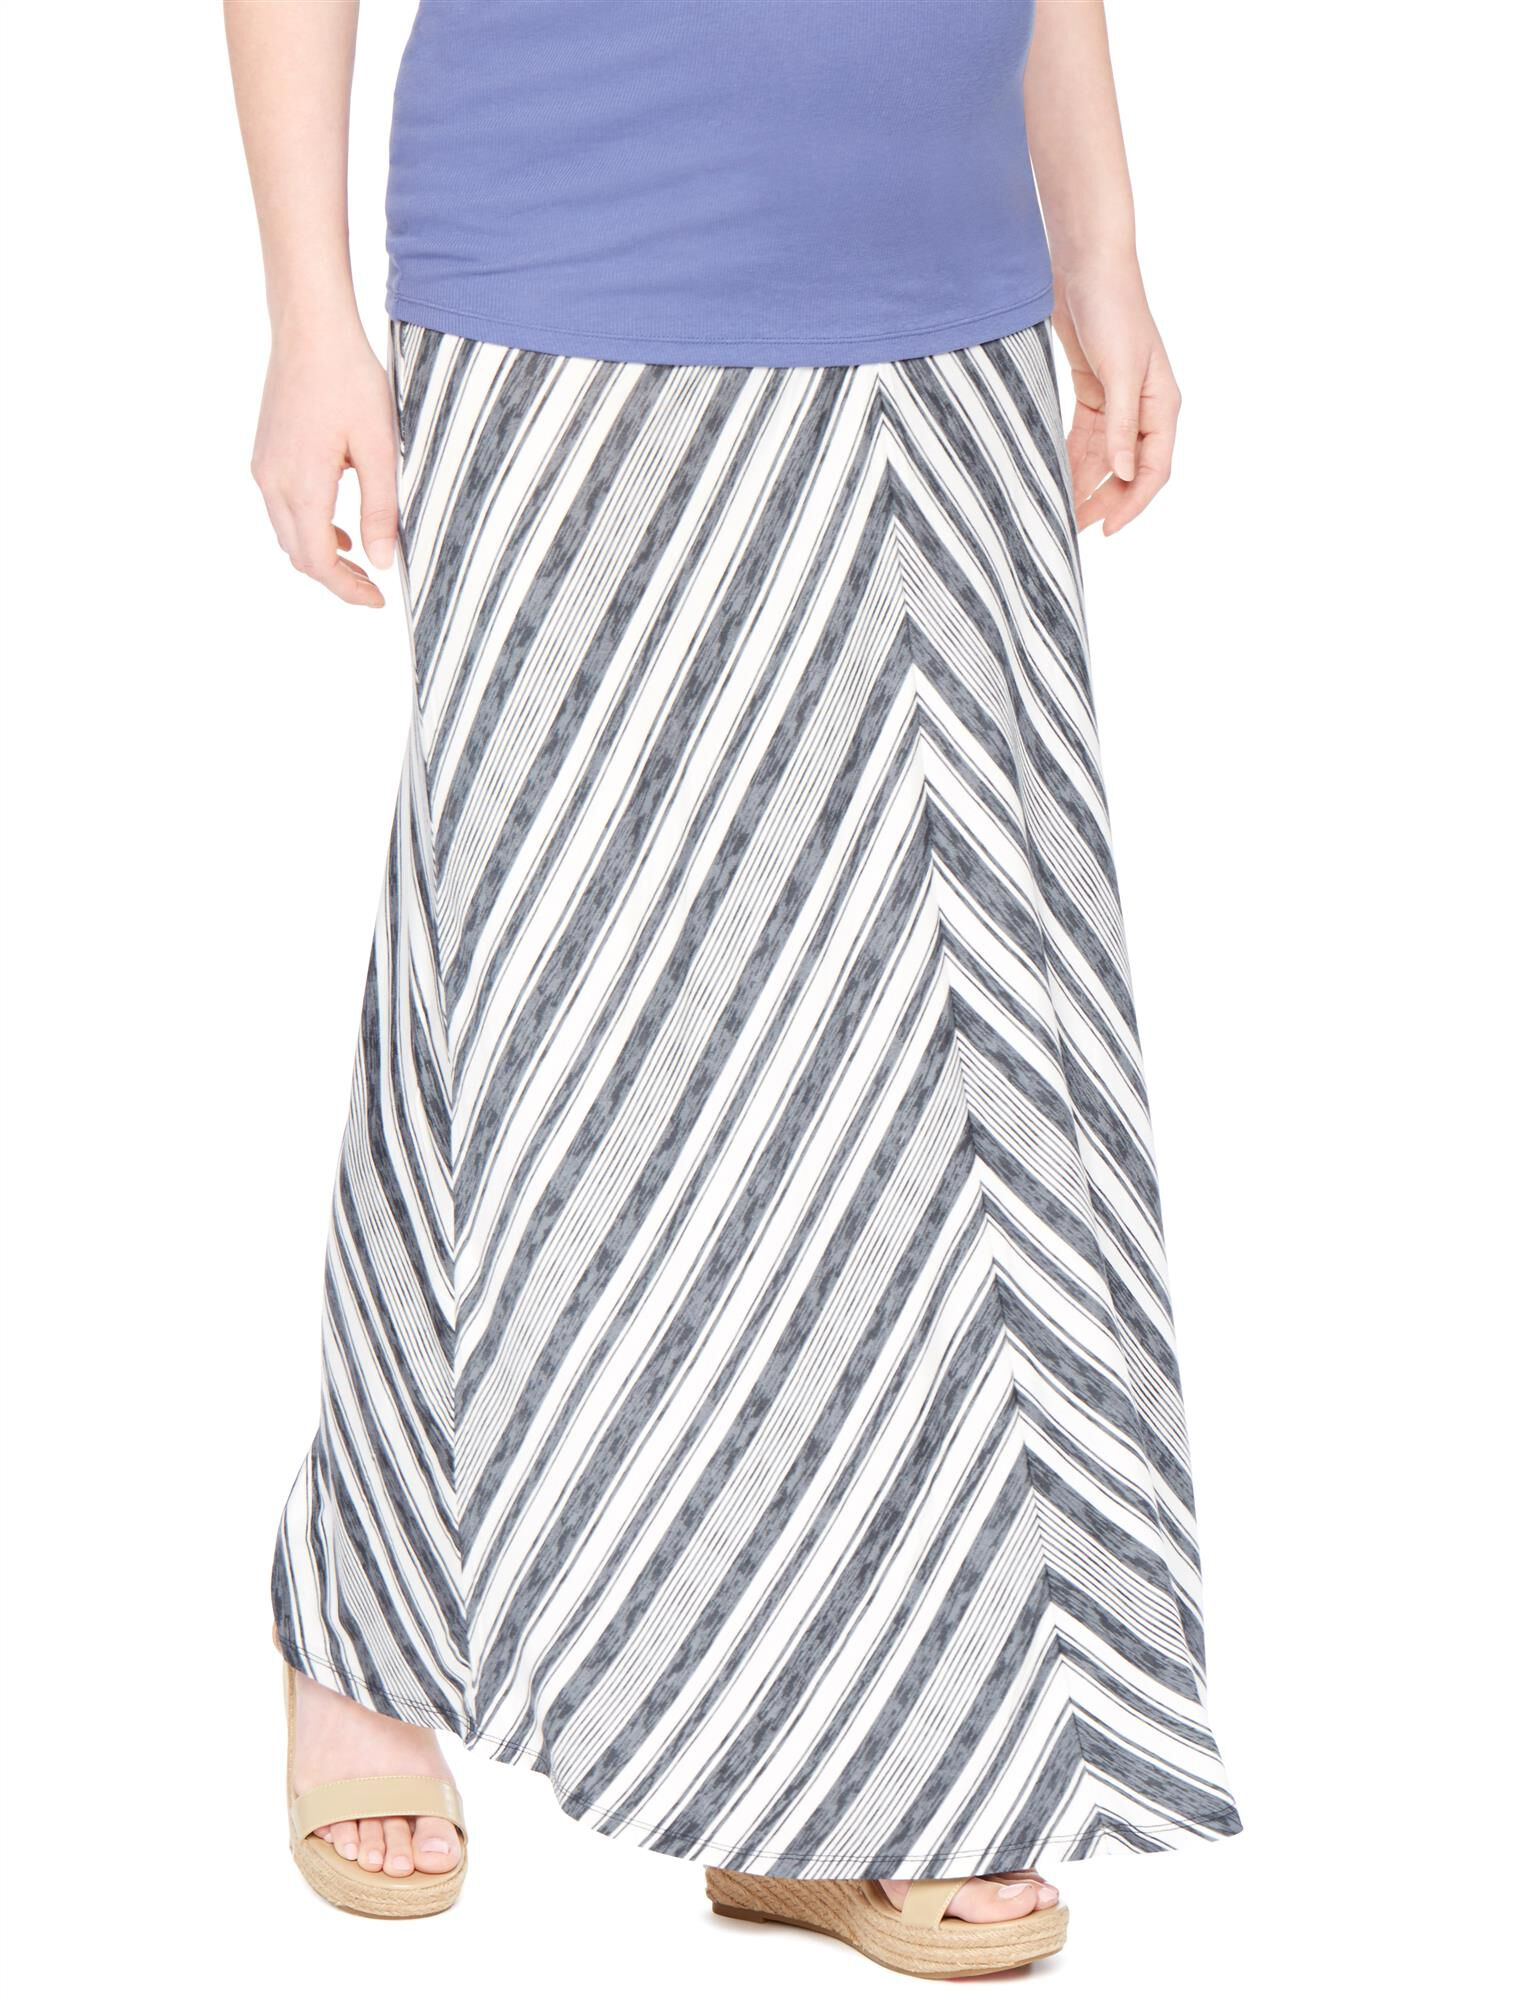 Fold Over Belly Maternity Maxi Skirt- Grey/White Stripe